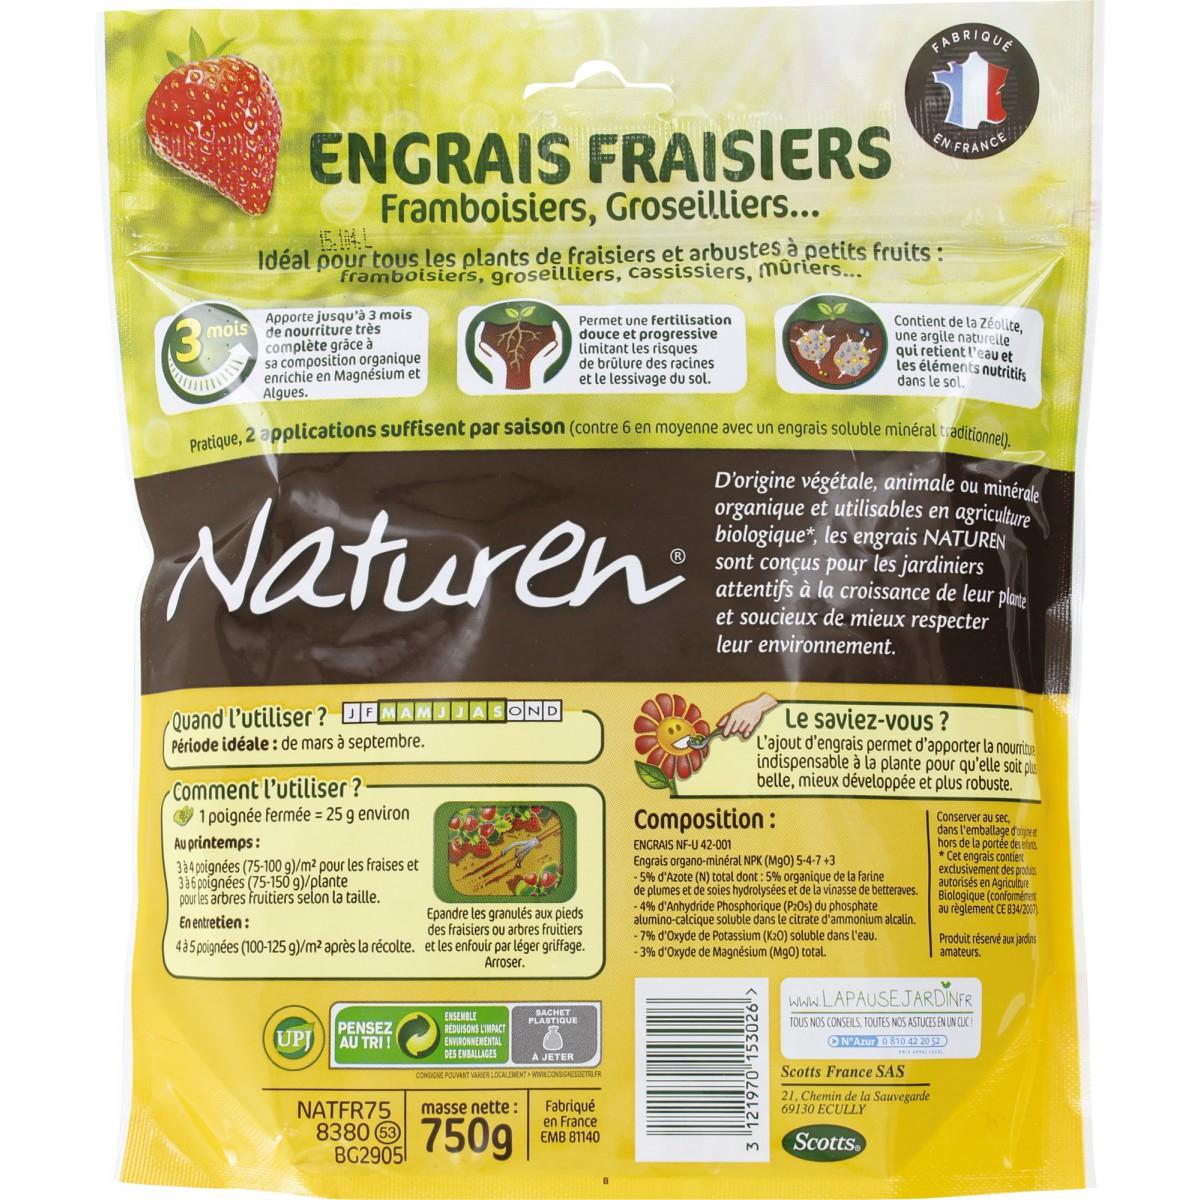 Engrais fraisiers naturen de engrais fraisier 1071909 for Engrais 3 fois 15